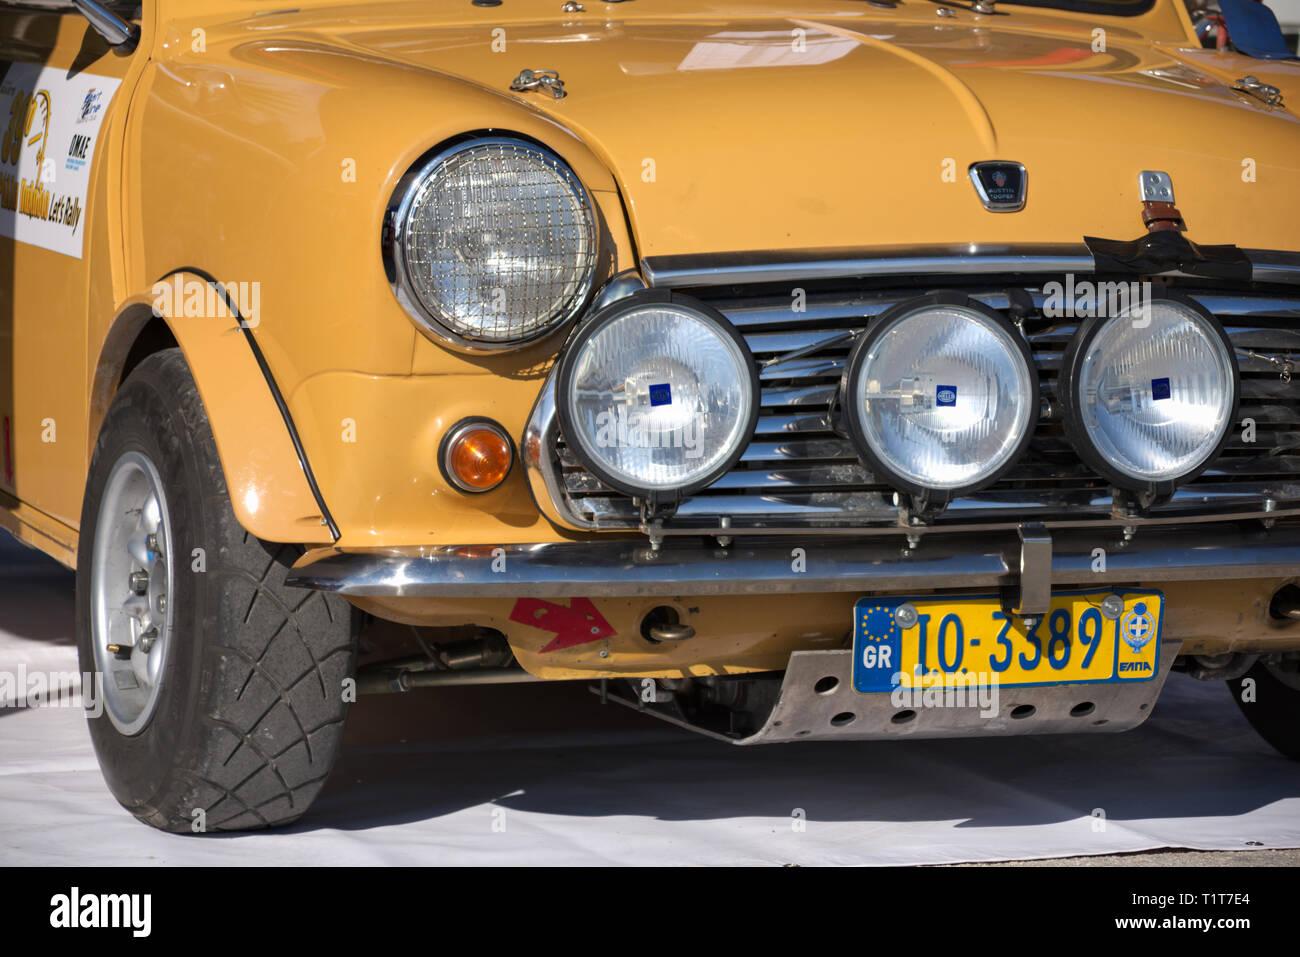 a9f9bd8799dcf7 Historic (Retro) Cars at 39th Palladion Rally of Greece. Mitropoulos -  Tsantzalis with